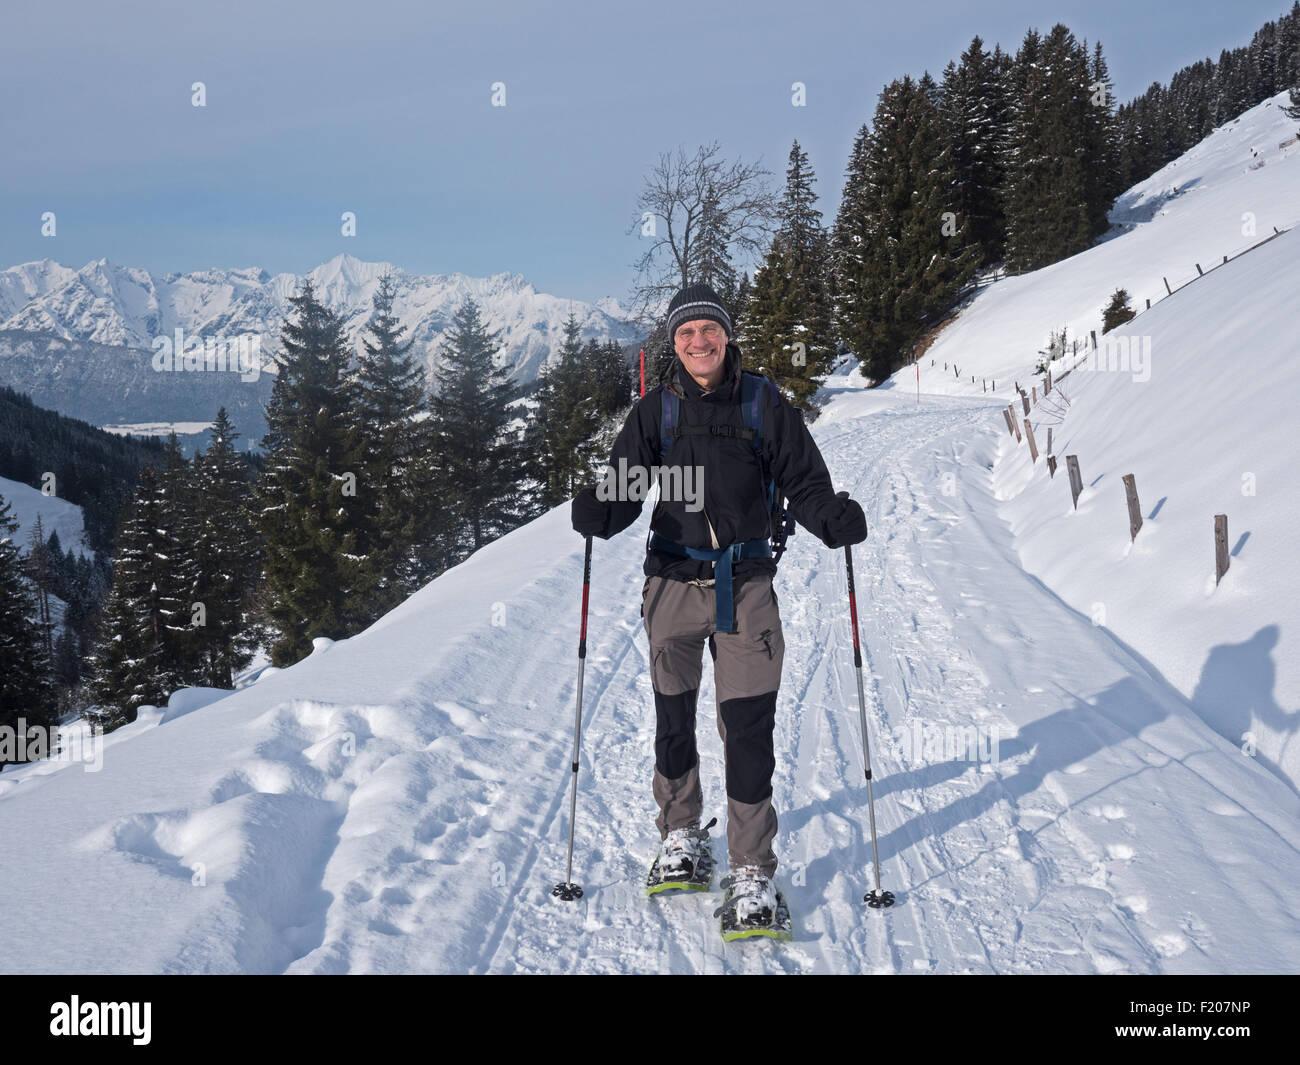 Schneeschuhwanderer in den Alpen Stock Photo